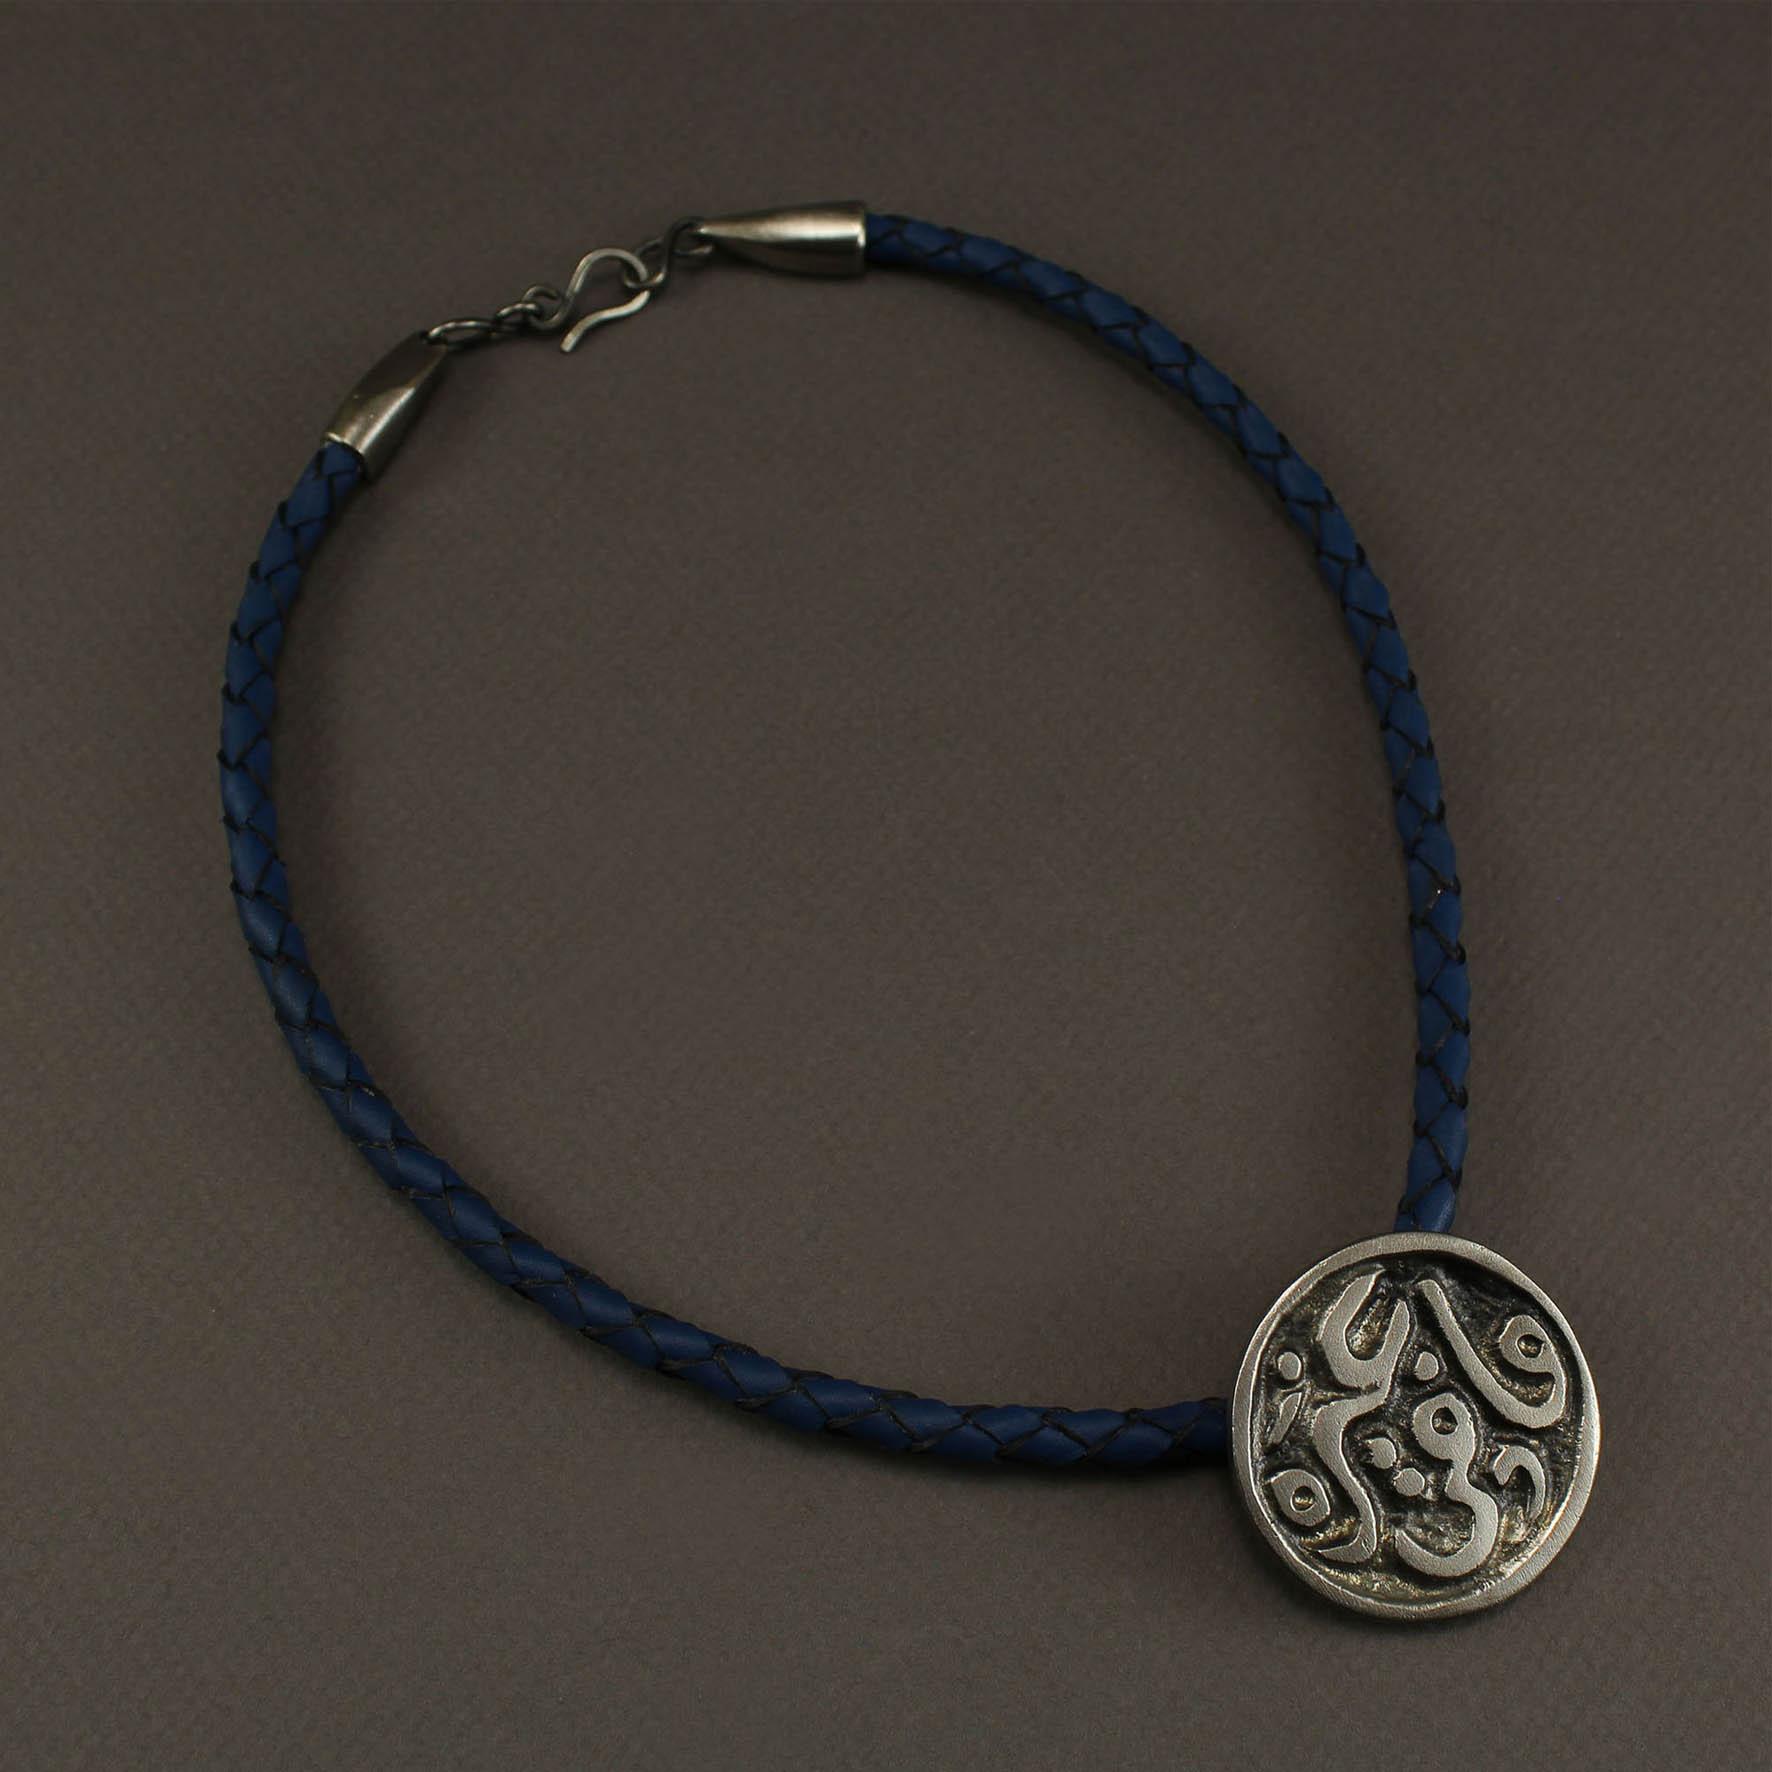 Mafi Ghairo Braided Necklace